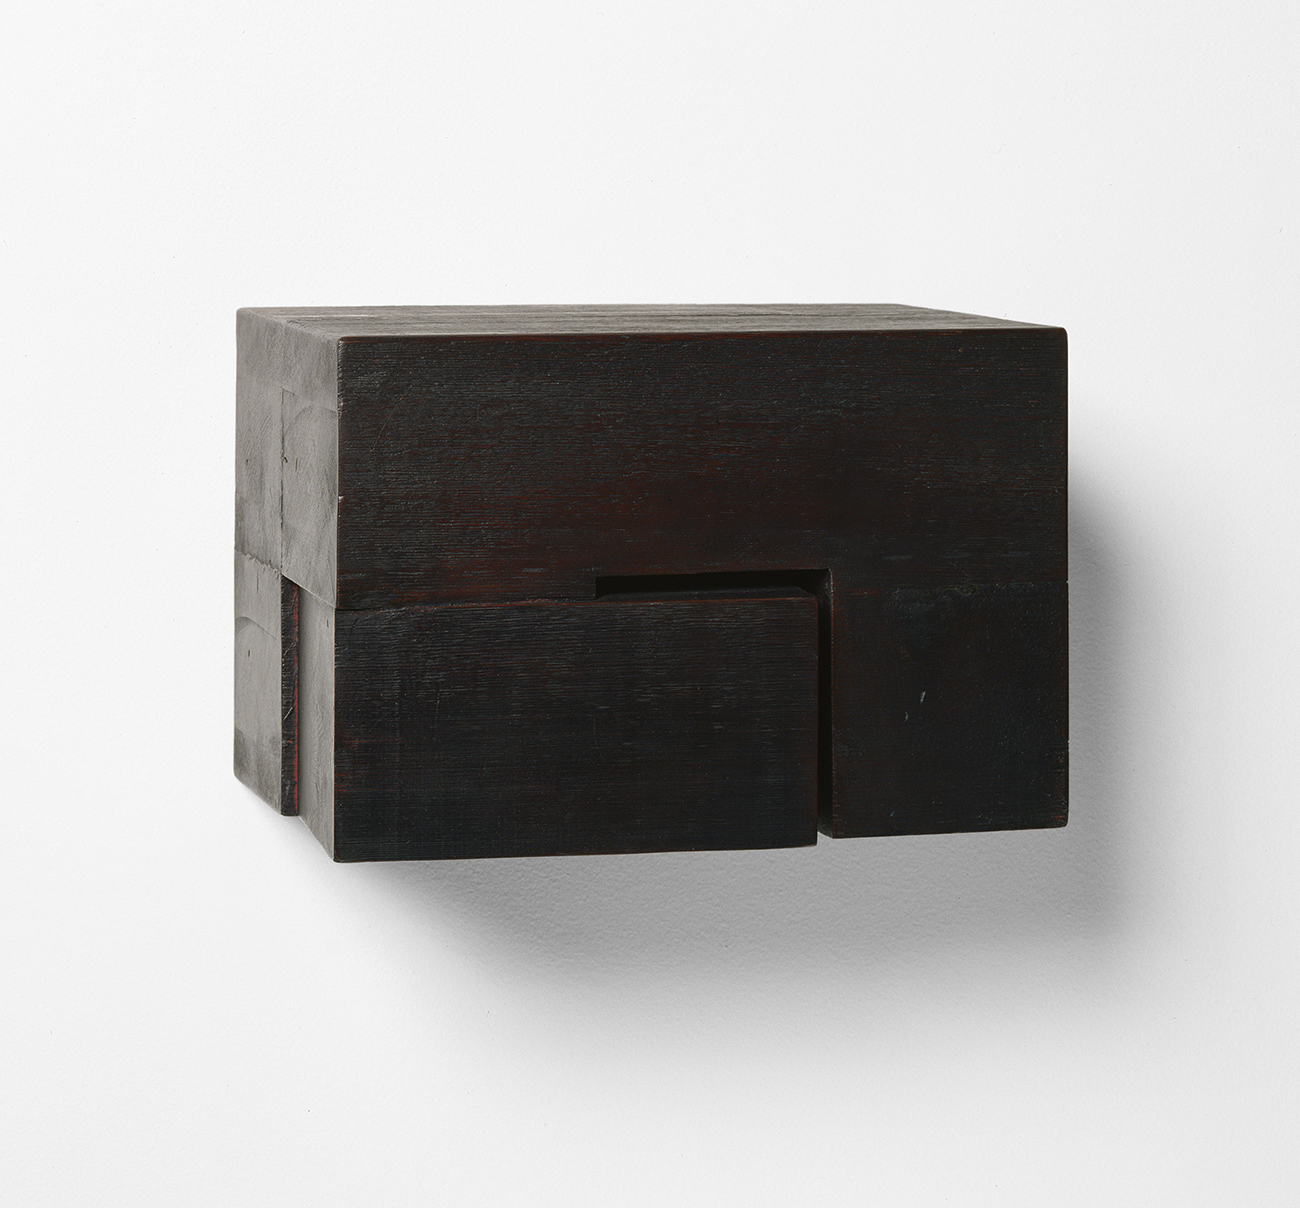 Demeure X  (1990)   Bois polychrome, 16.5 x 24.8 x 17.1 cm, collection privée. photo : Richard-Max Tremblay